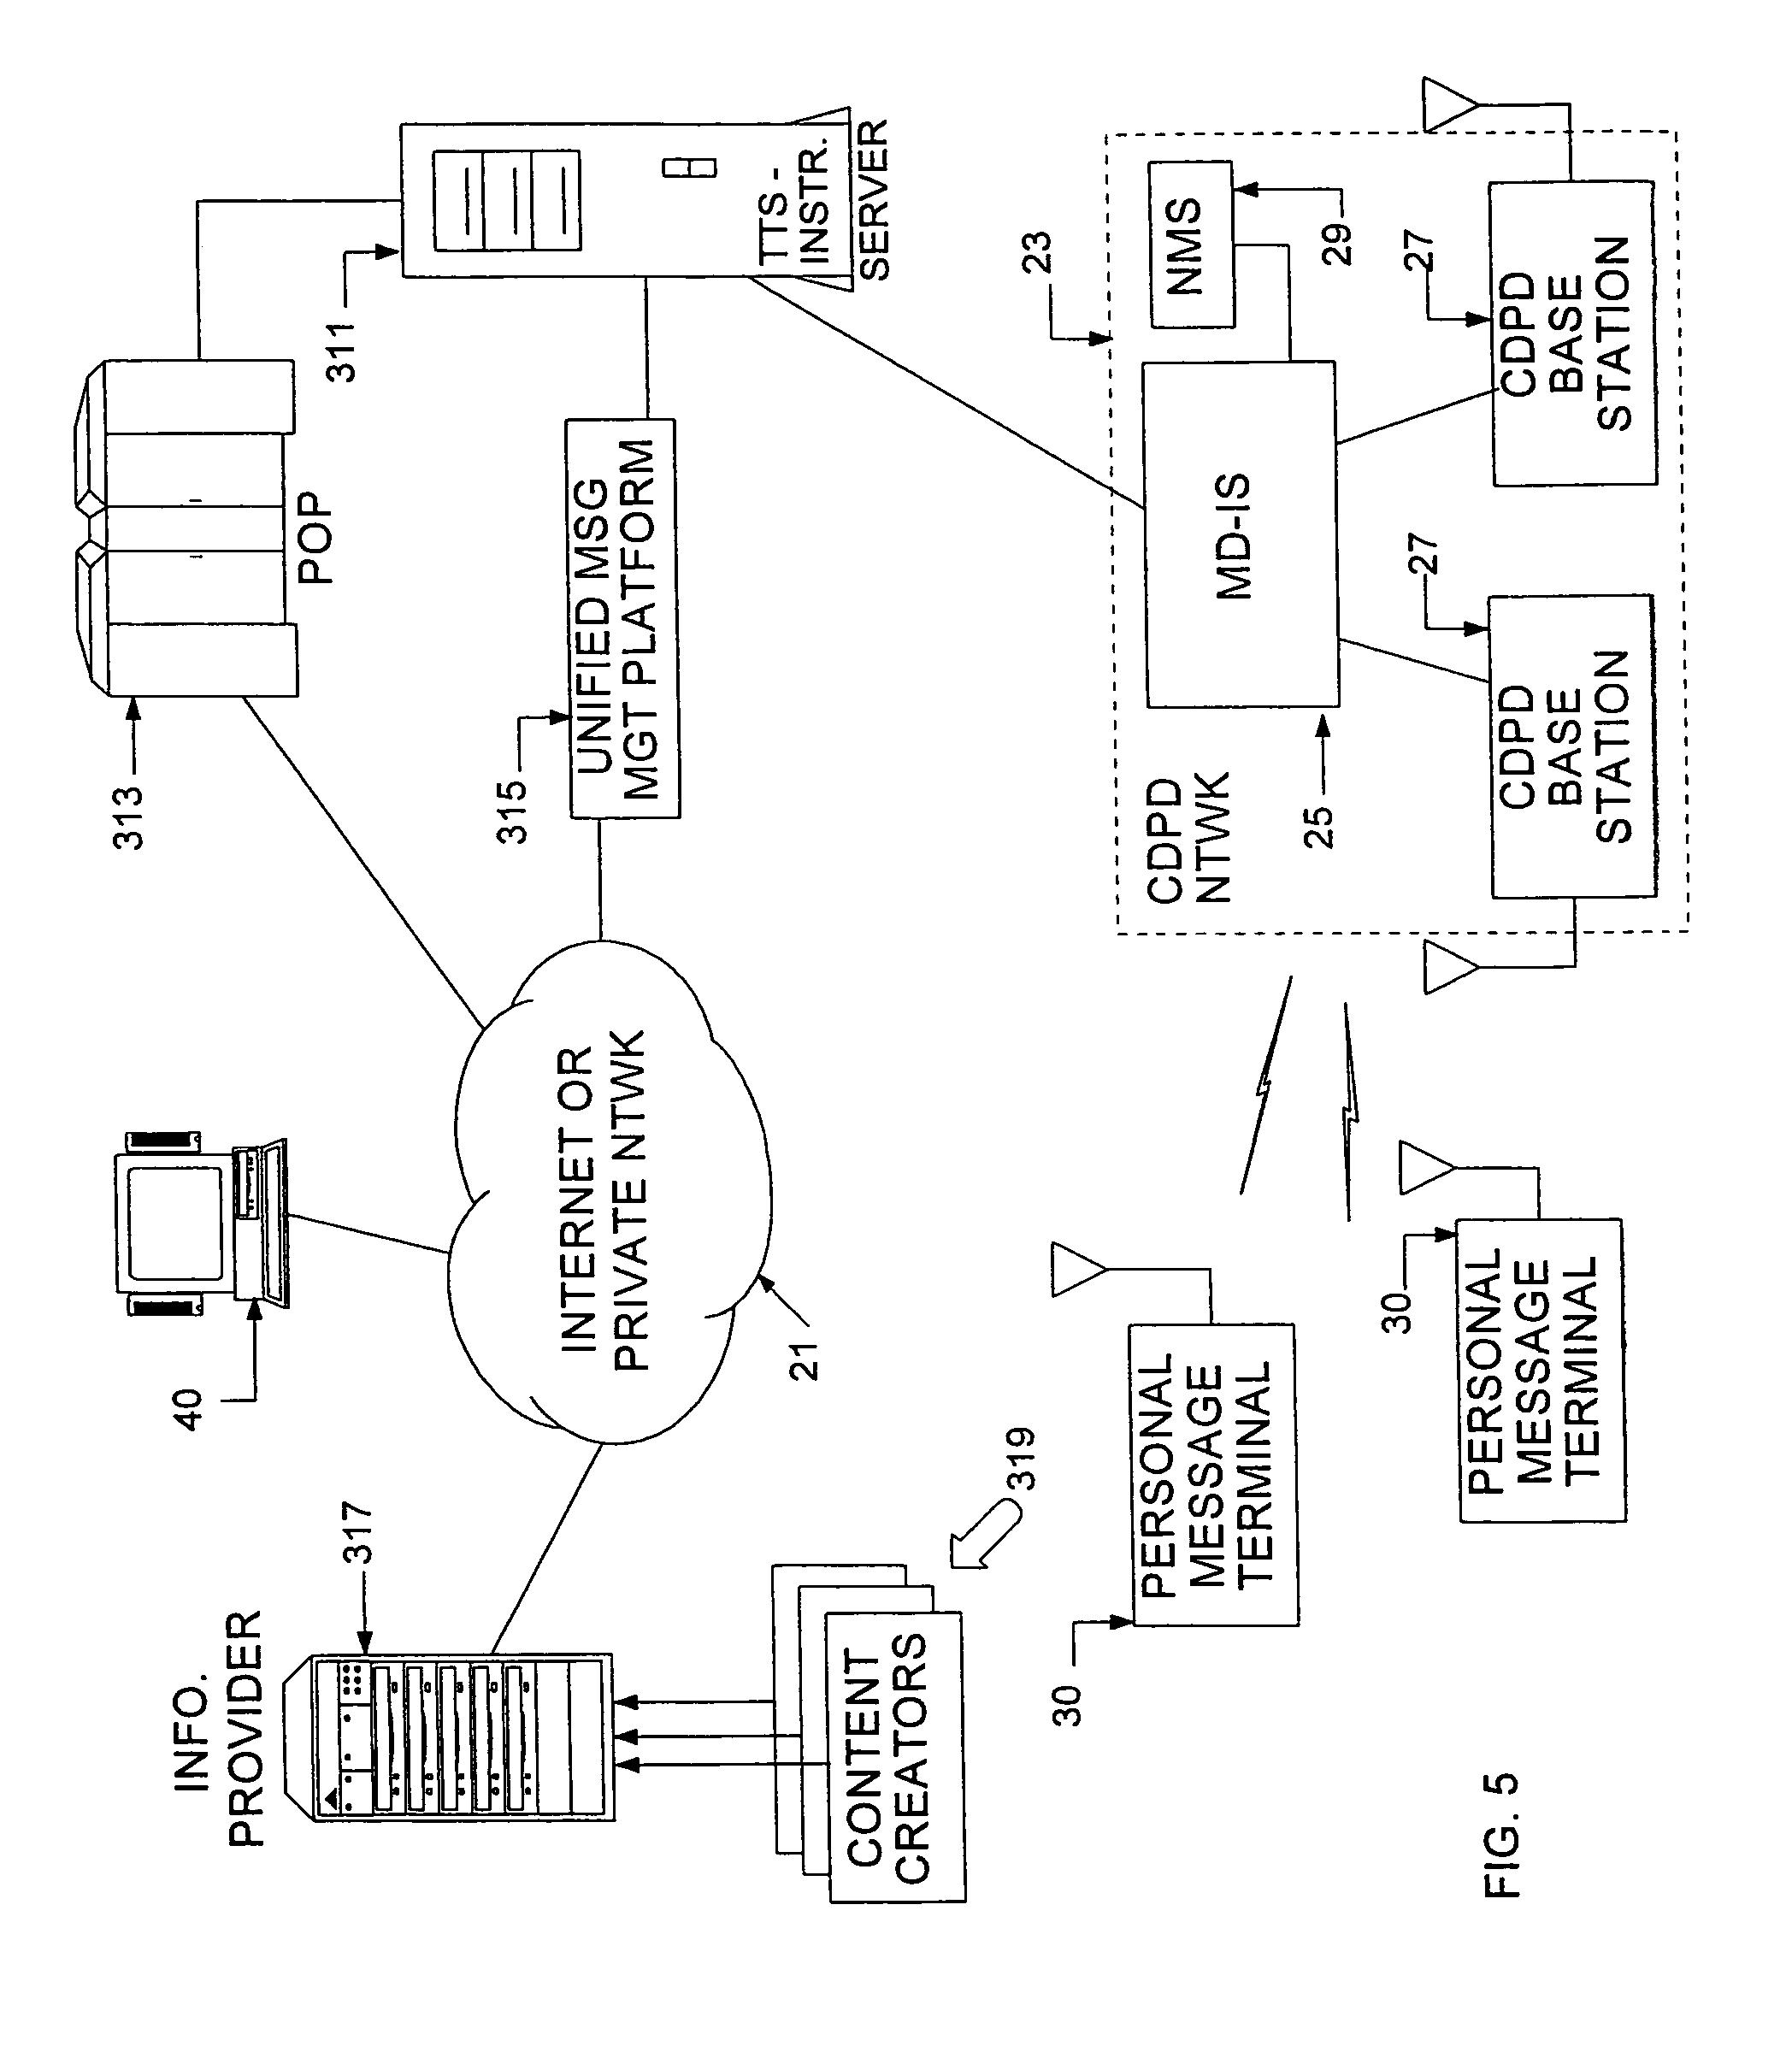 speech synthesis server